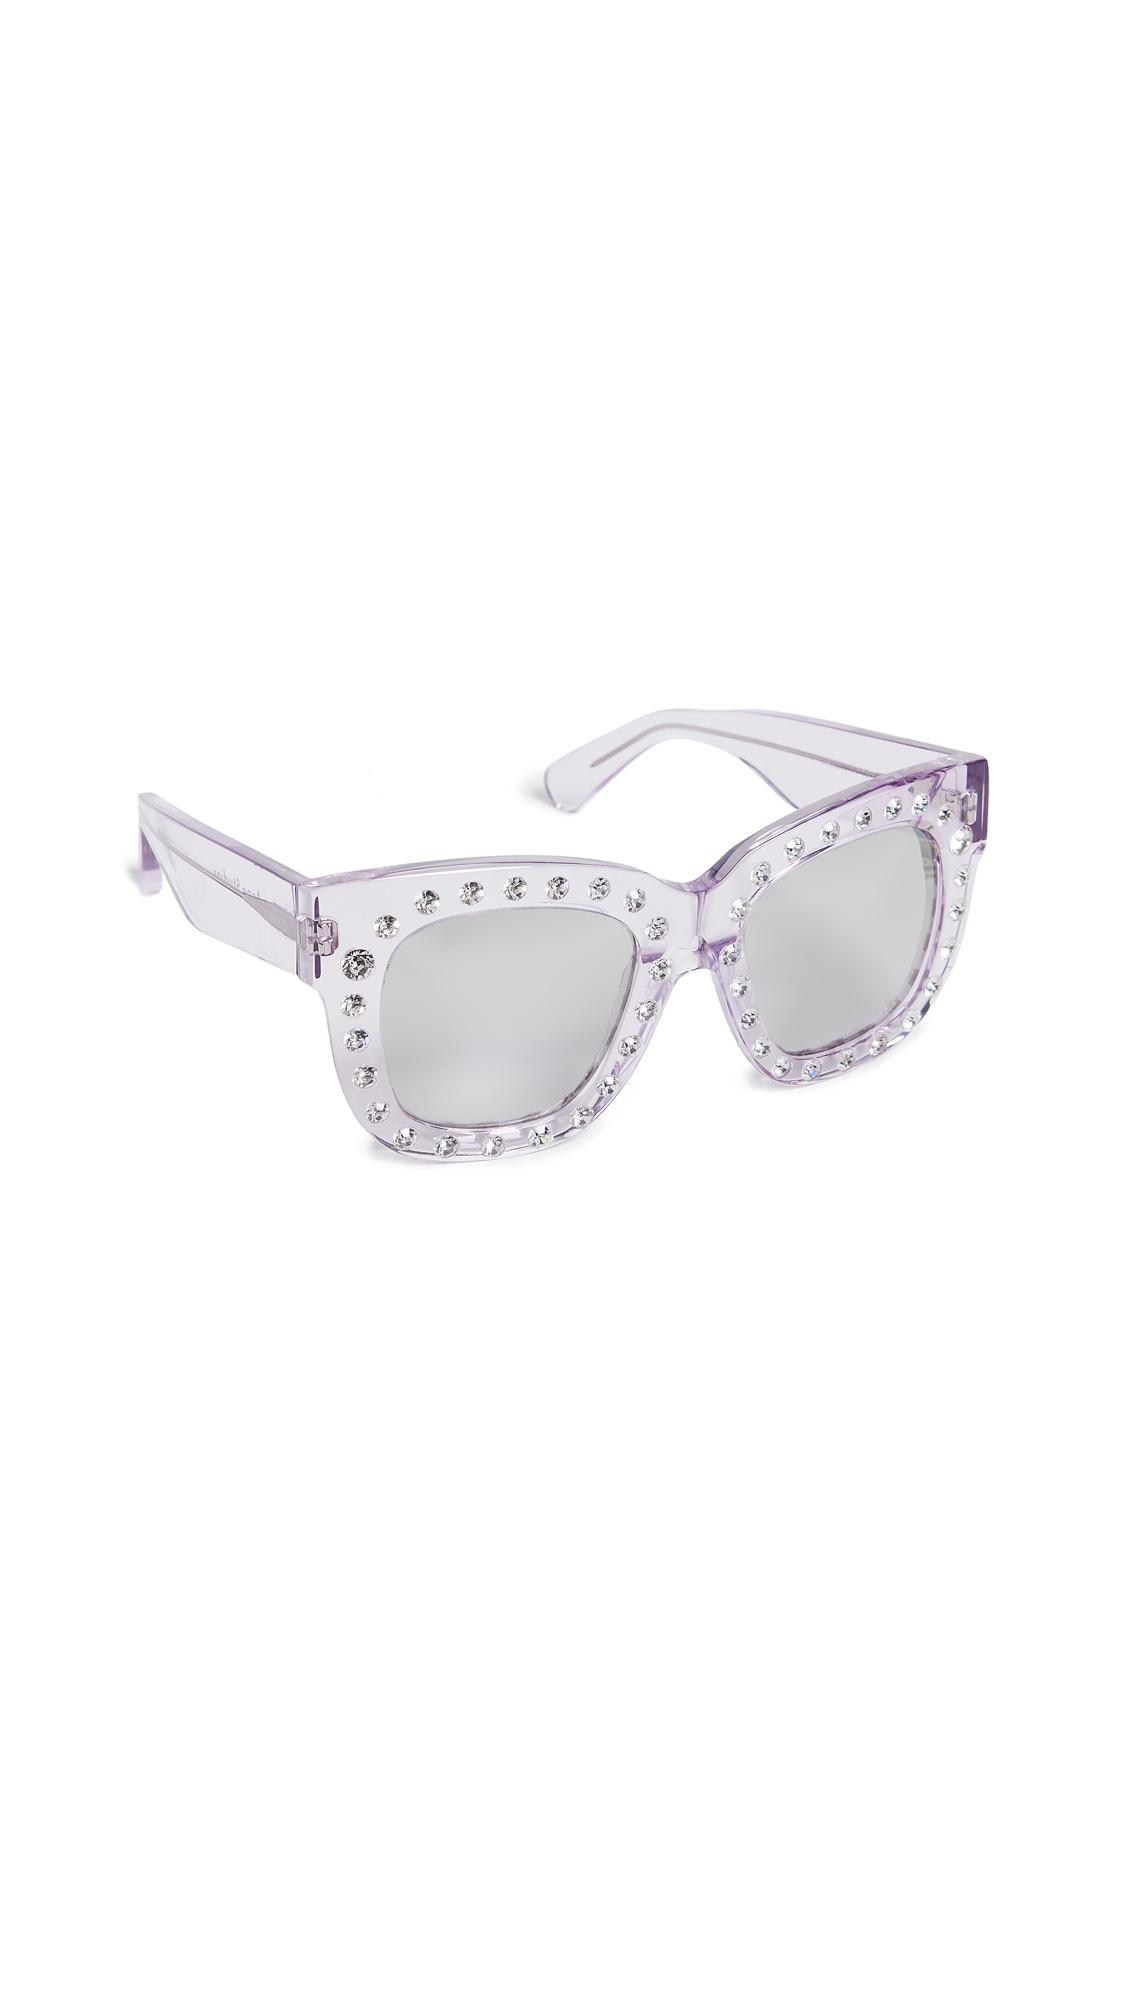 Acne Studios Library Sunglasses - Lilac/Silver